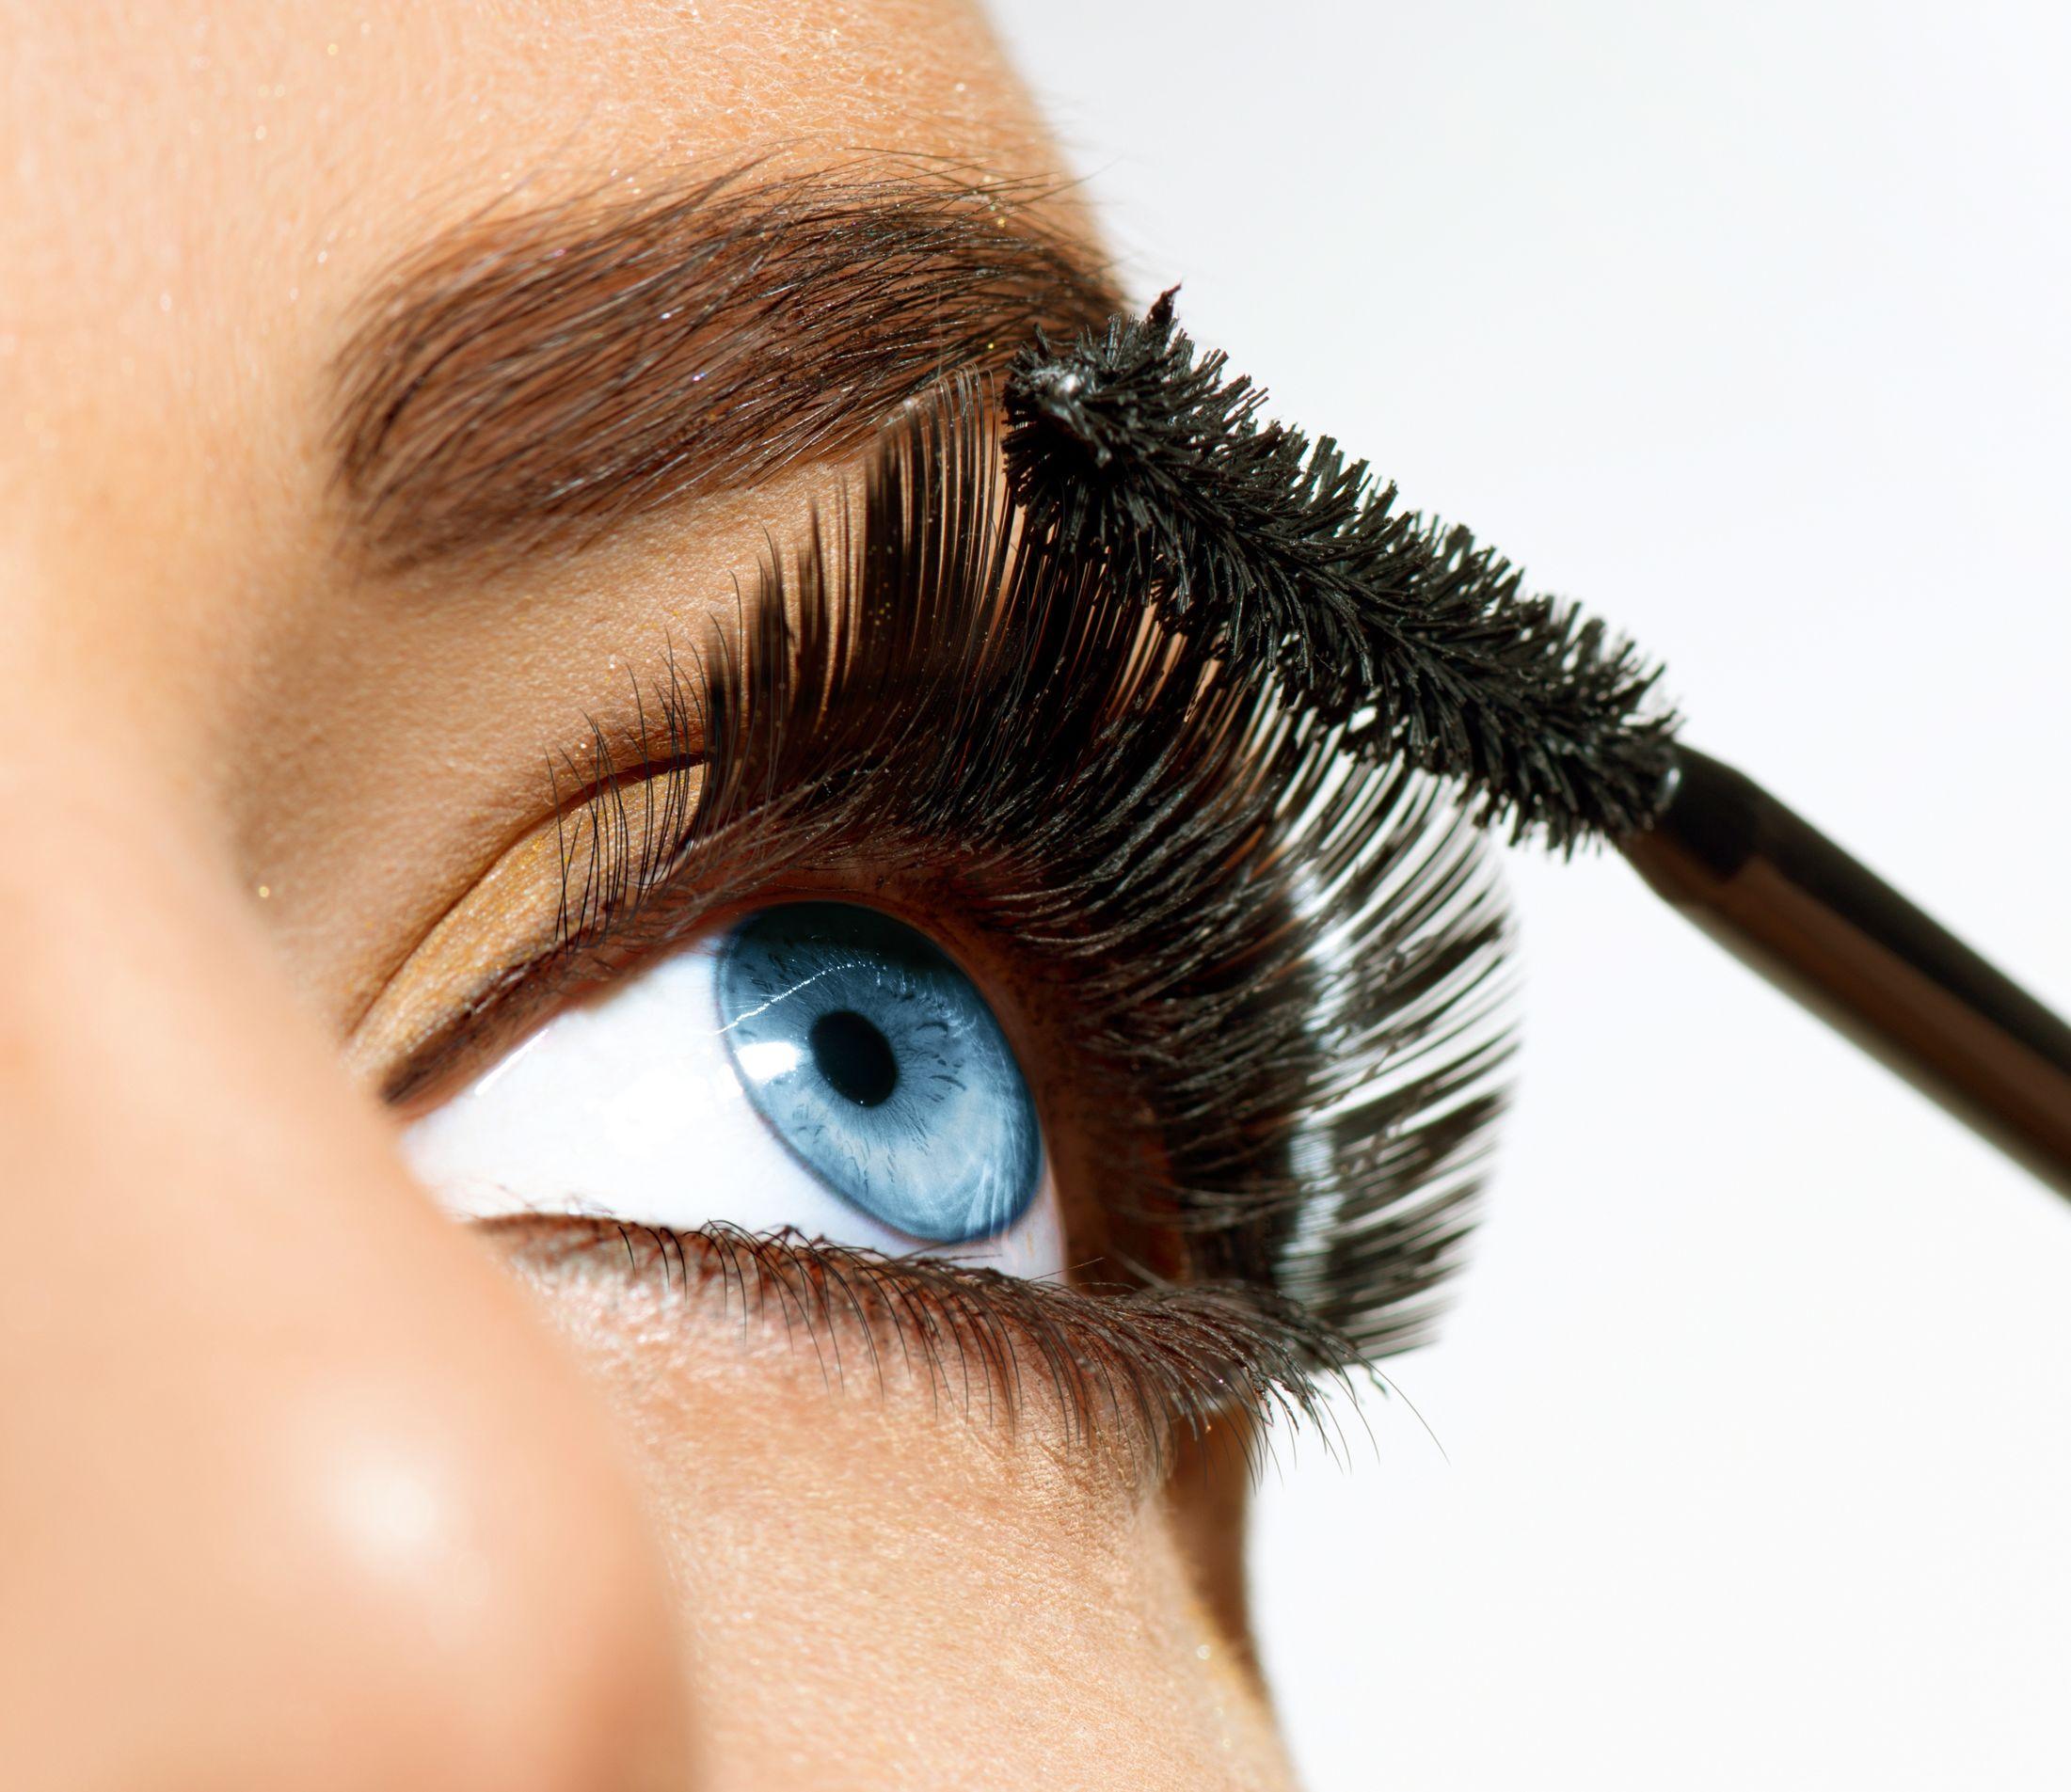 21386666 - mascara applying long lashes closeup ...